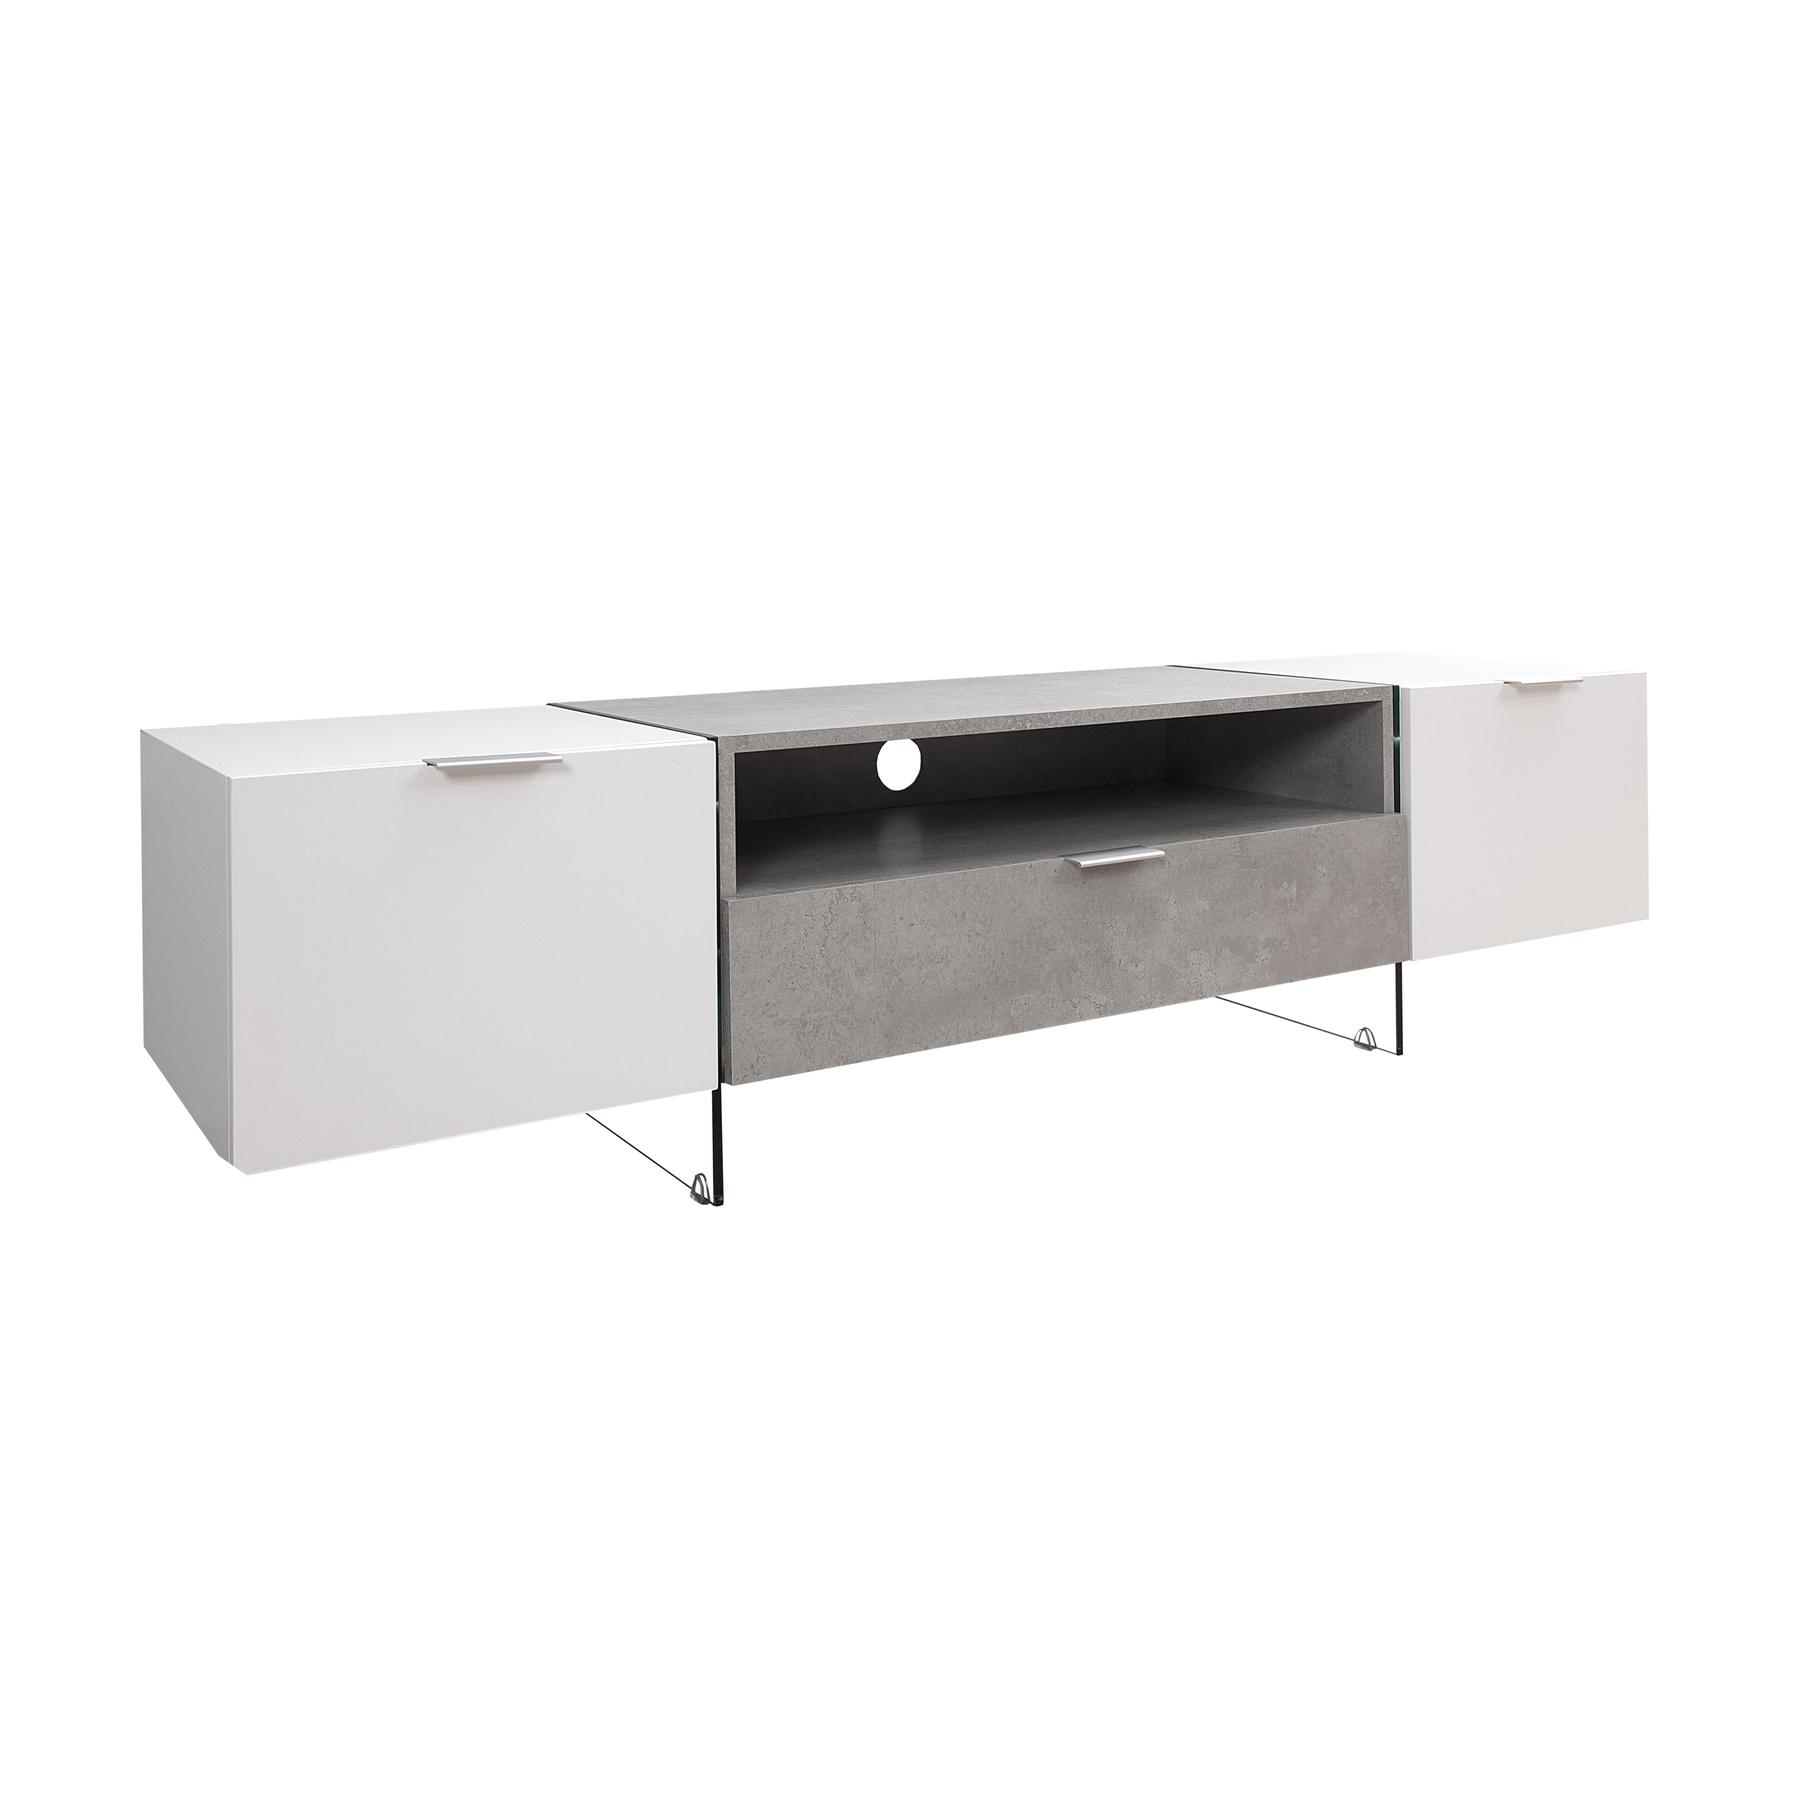 design tv lowboard onyx edelmatt weiss beton optik 160 cm board mit schublade ebay. Black Bedroom Furniture Sets. Home Design Ideas